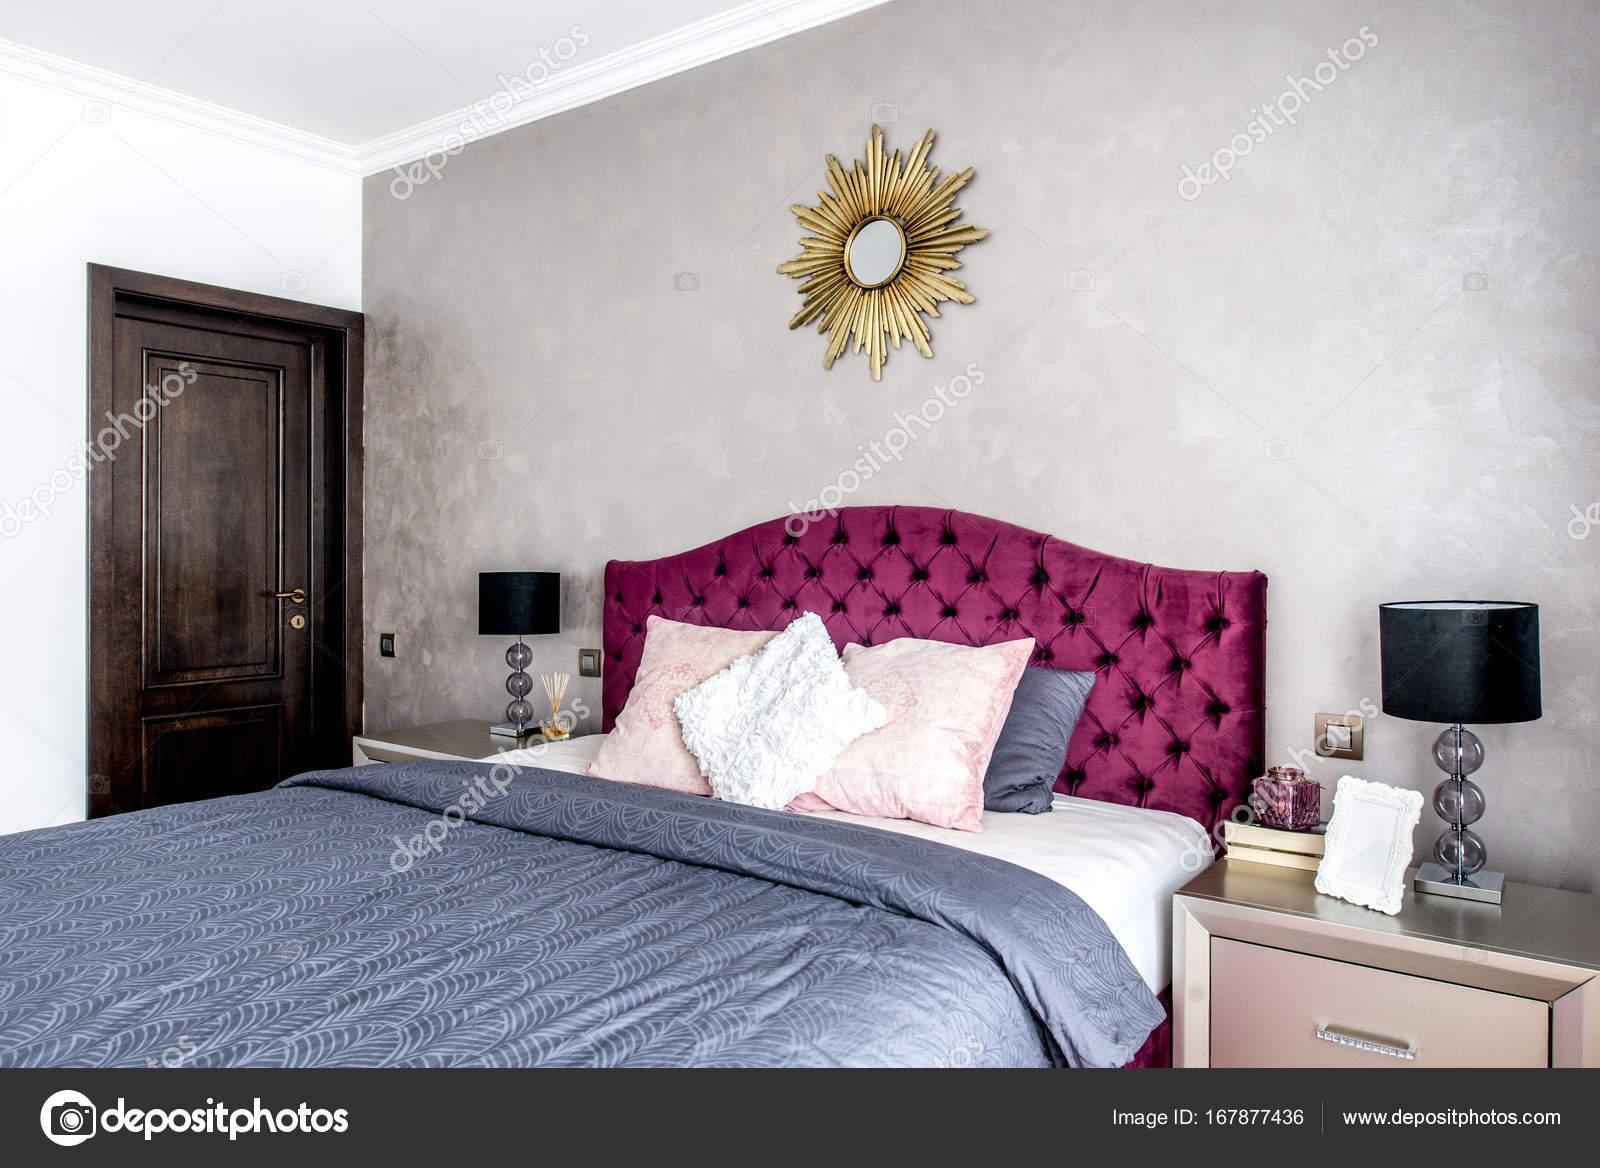 Modern Gezellig Interieur : Modern en gezellig interieur slaapkamer ontwerp u2014 stockfoto © bogdan